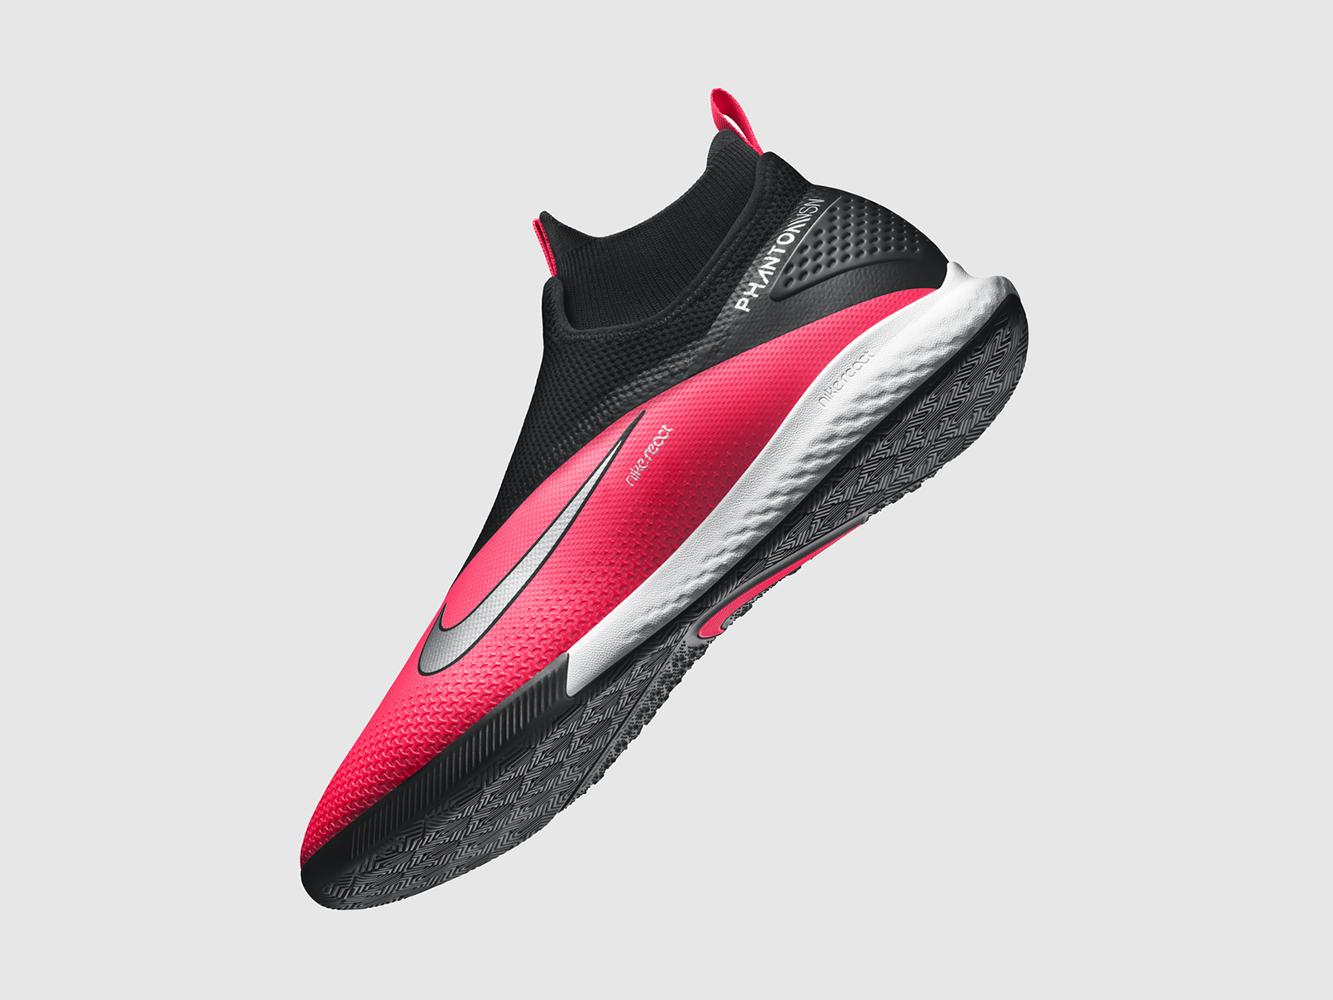 Nike_Football_PhantomVSN2_IC_4_93363